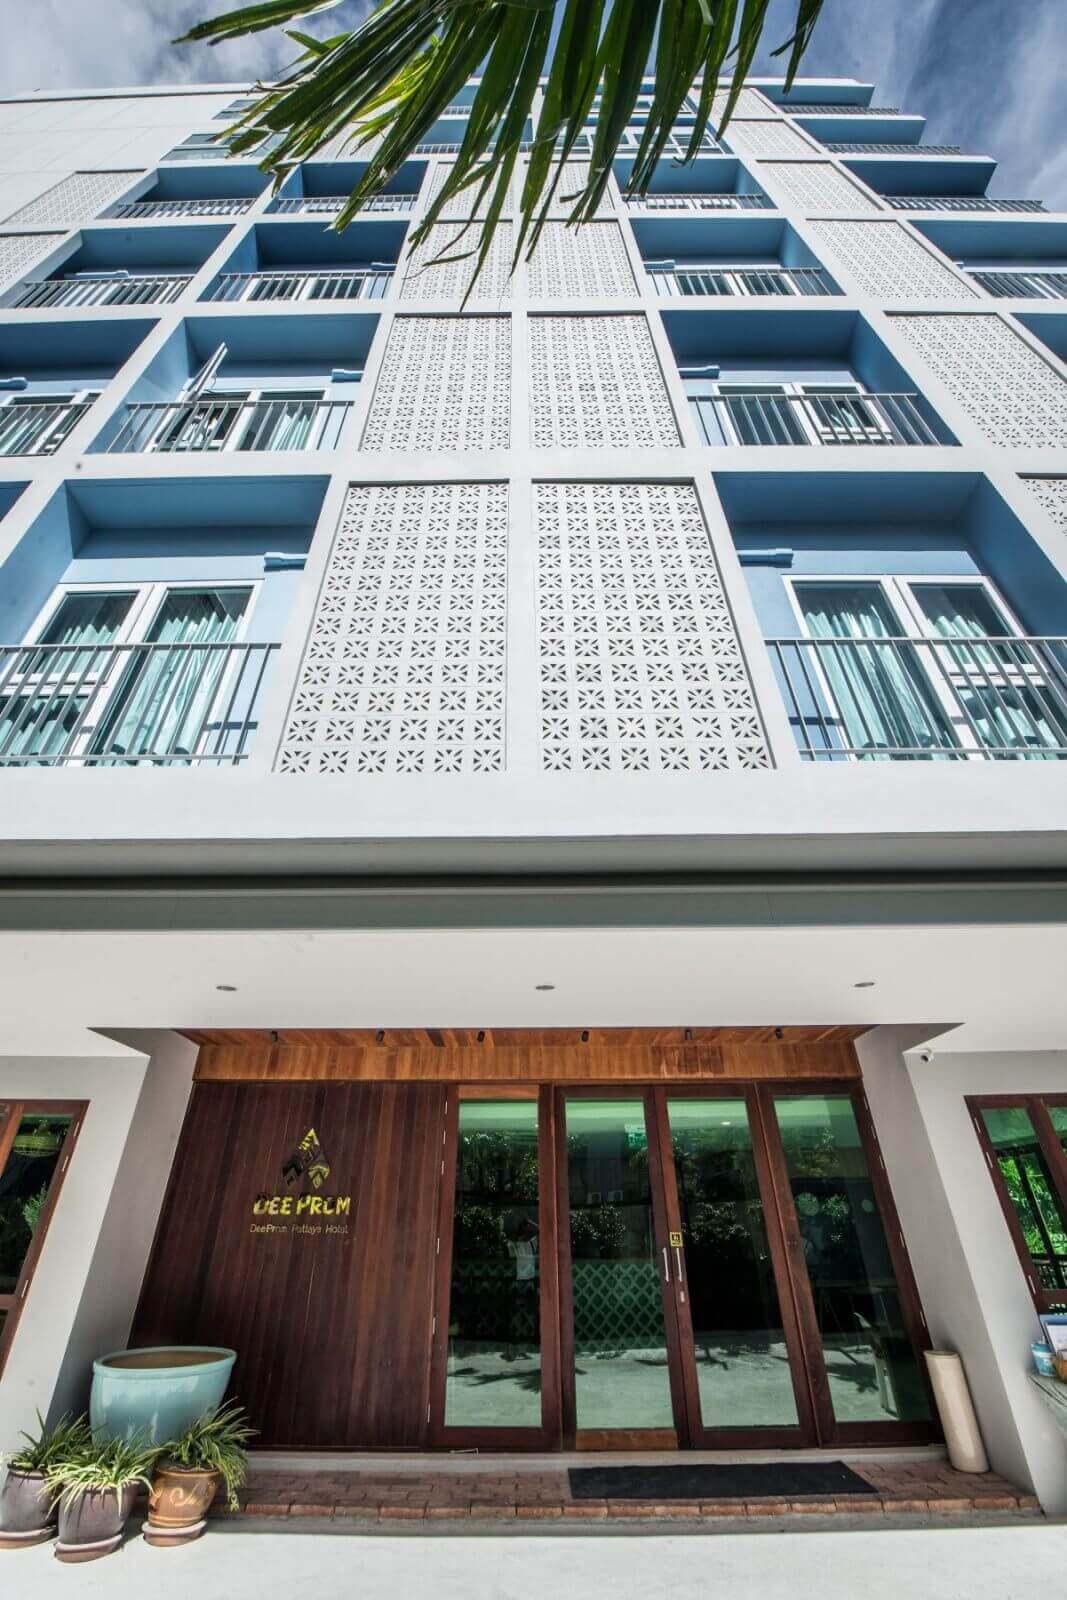 DeeProm Pattaya Hotel รร แบบไทยๆน่ารัก อบอุ่นเหมือนบ้าน อาหารอร่อย พนักงานใจดี เป็นมิตร